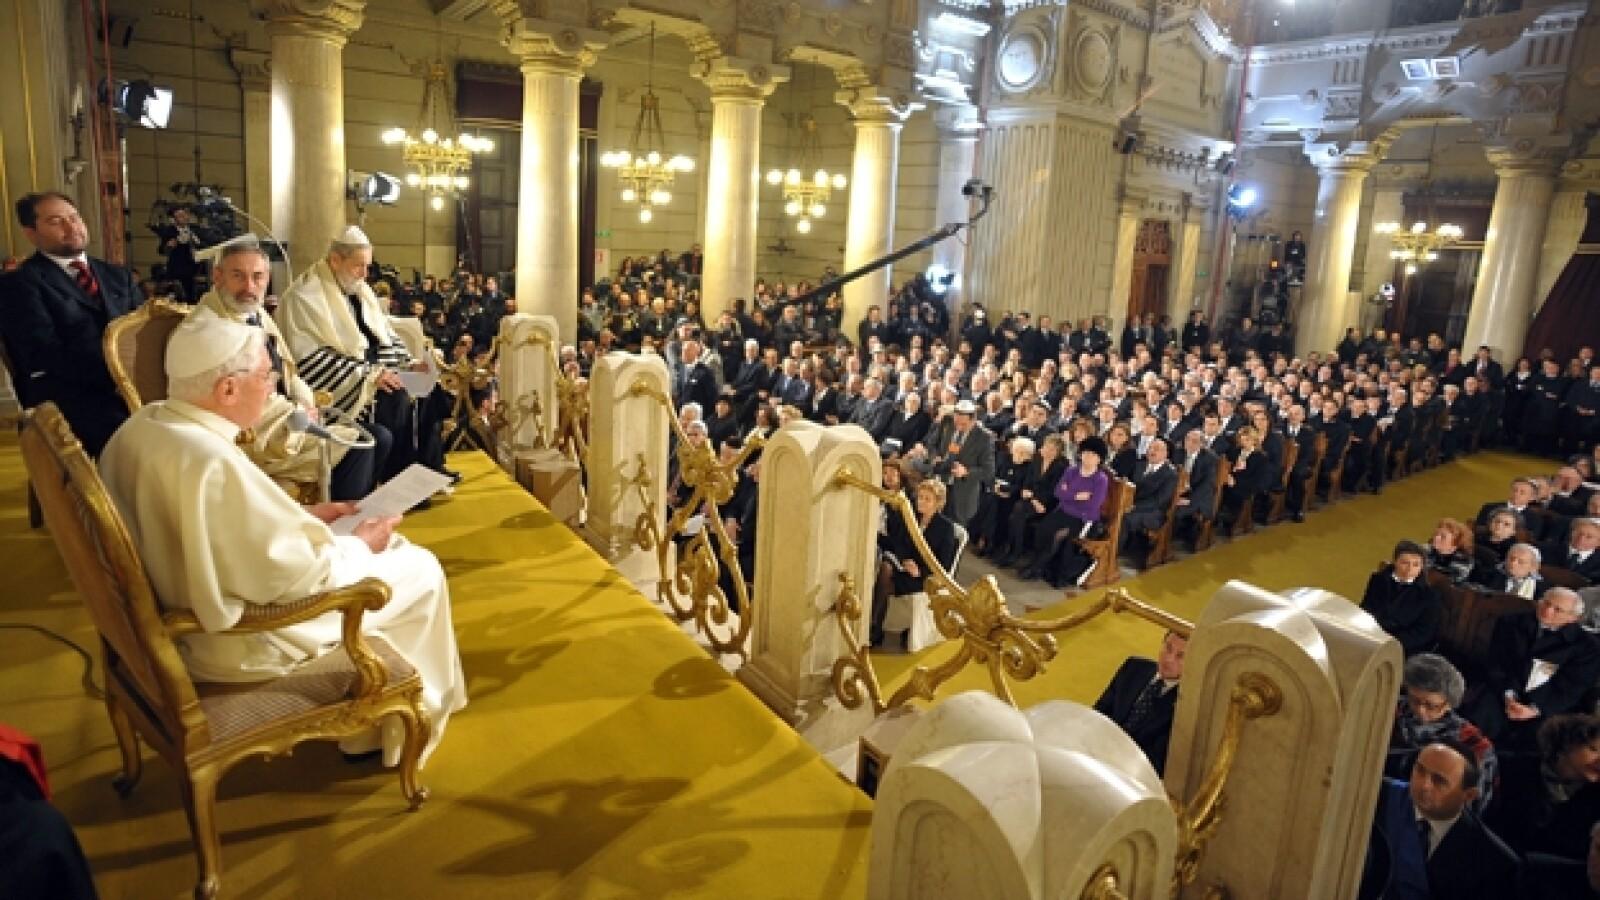 Benedicto XVI papado 17